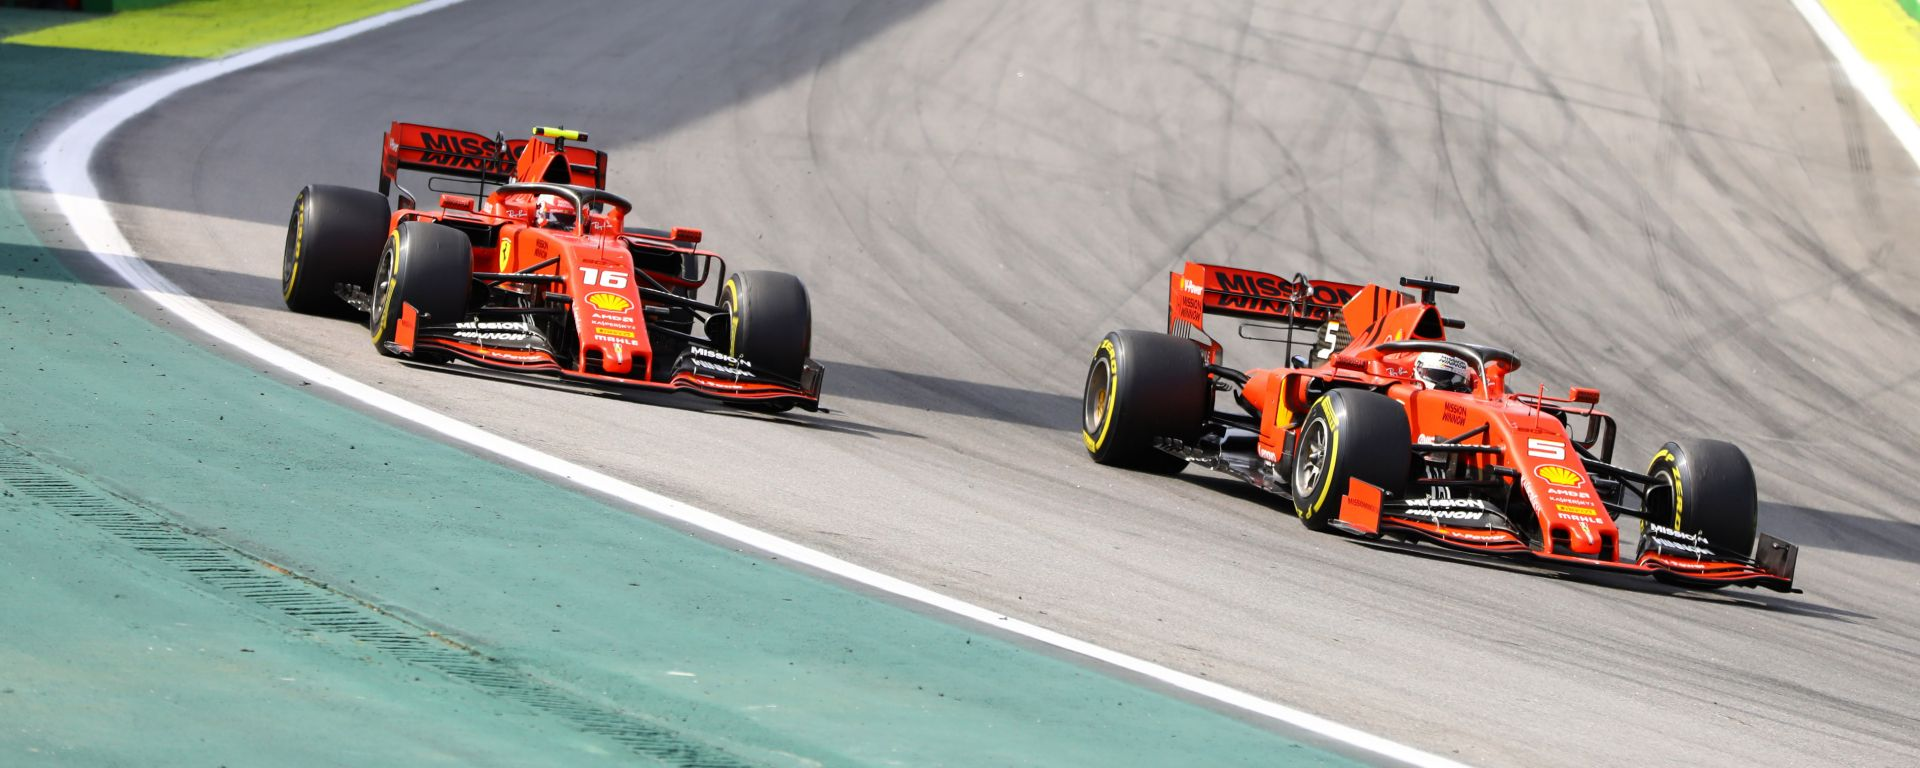 F1 GP Brasile 2019, Charles Leclerc e Sebastian Vettel (Ferrari)